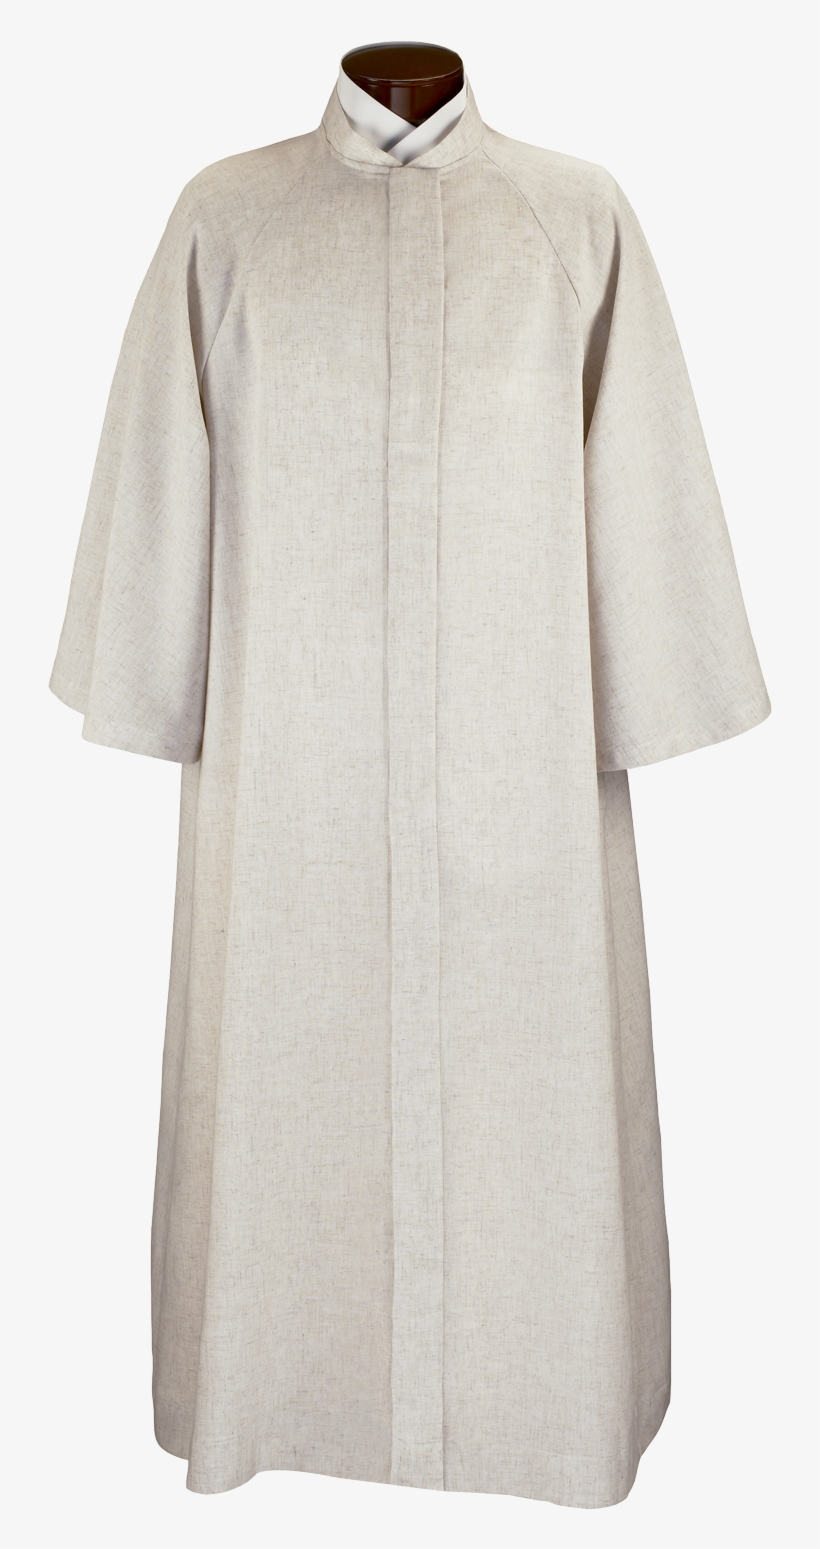 Choir Dress Robe Clothing Bishop PNG, Clipart, Academic Dress, Artwork,  Biretta, Bishop, Cassock Free PNG Download